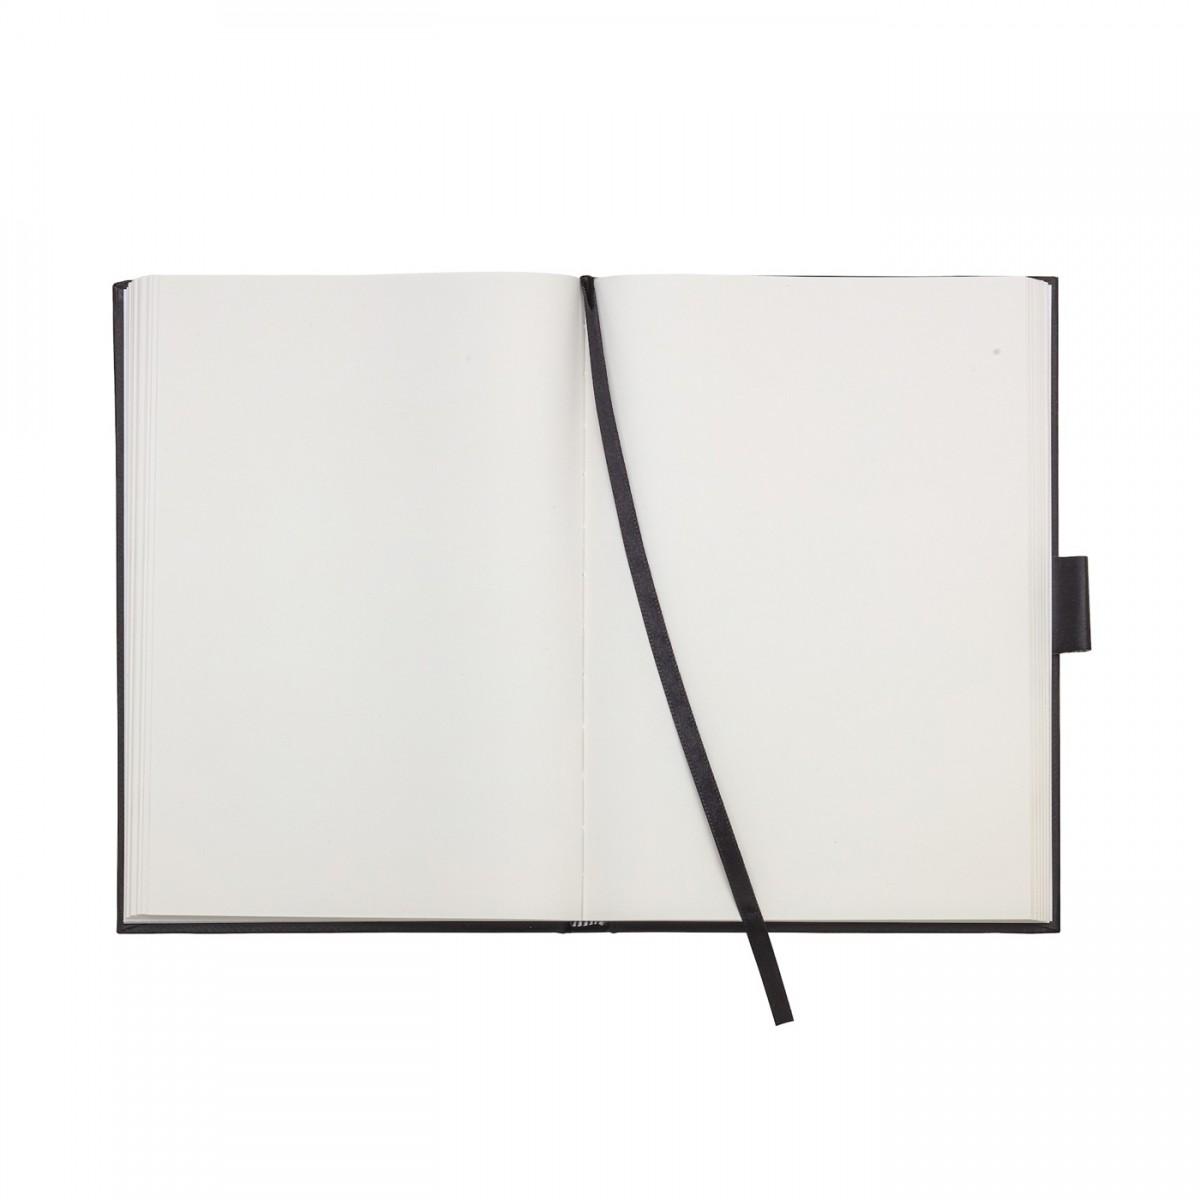 ArtbookstonepaperbogA5120g-01